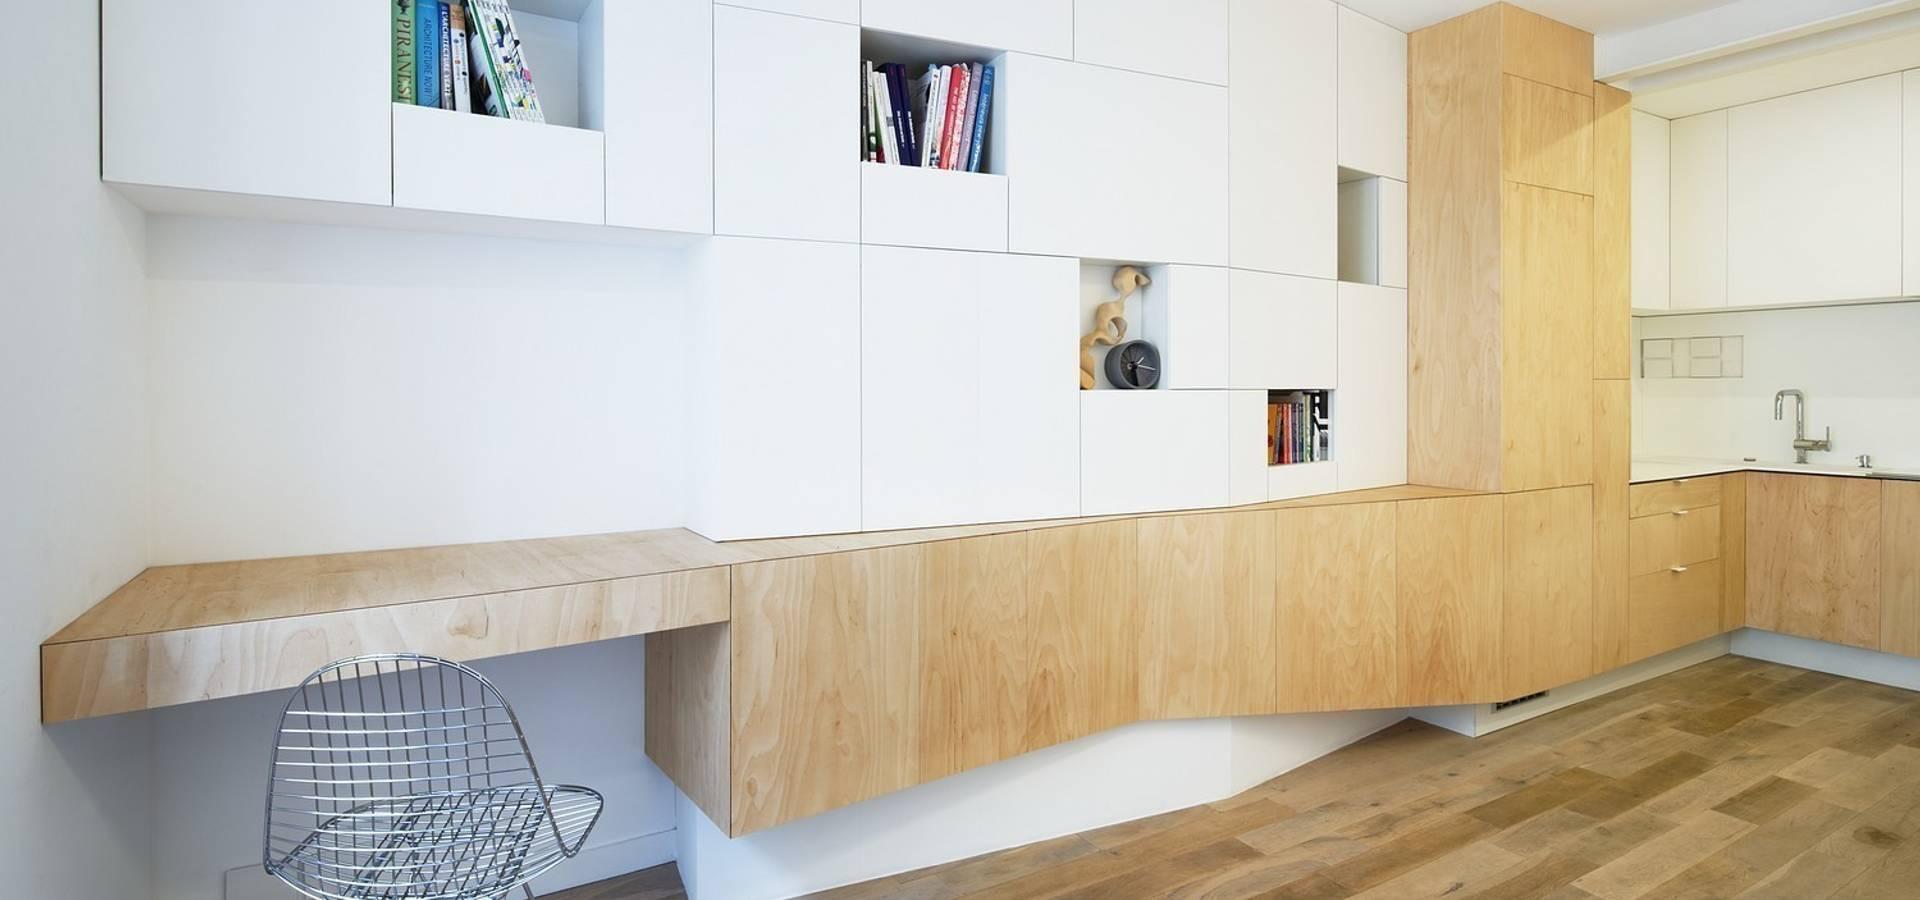 JFA | Joshua Florquin Architecture